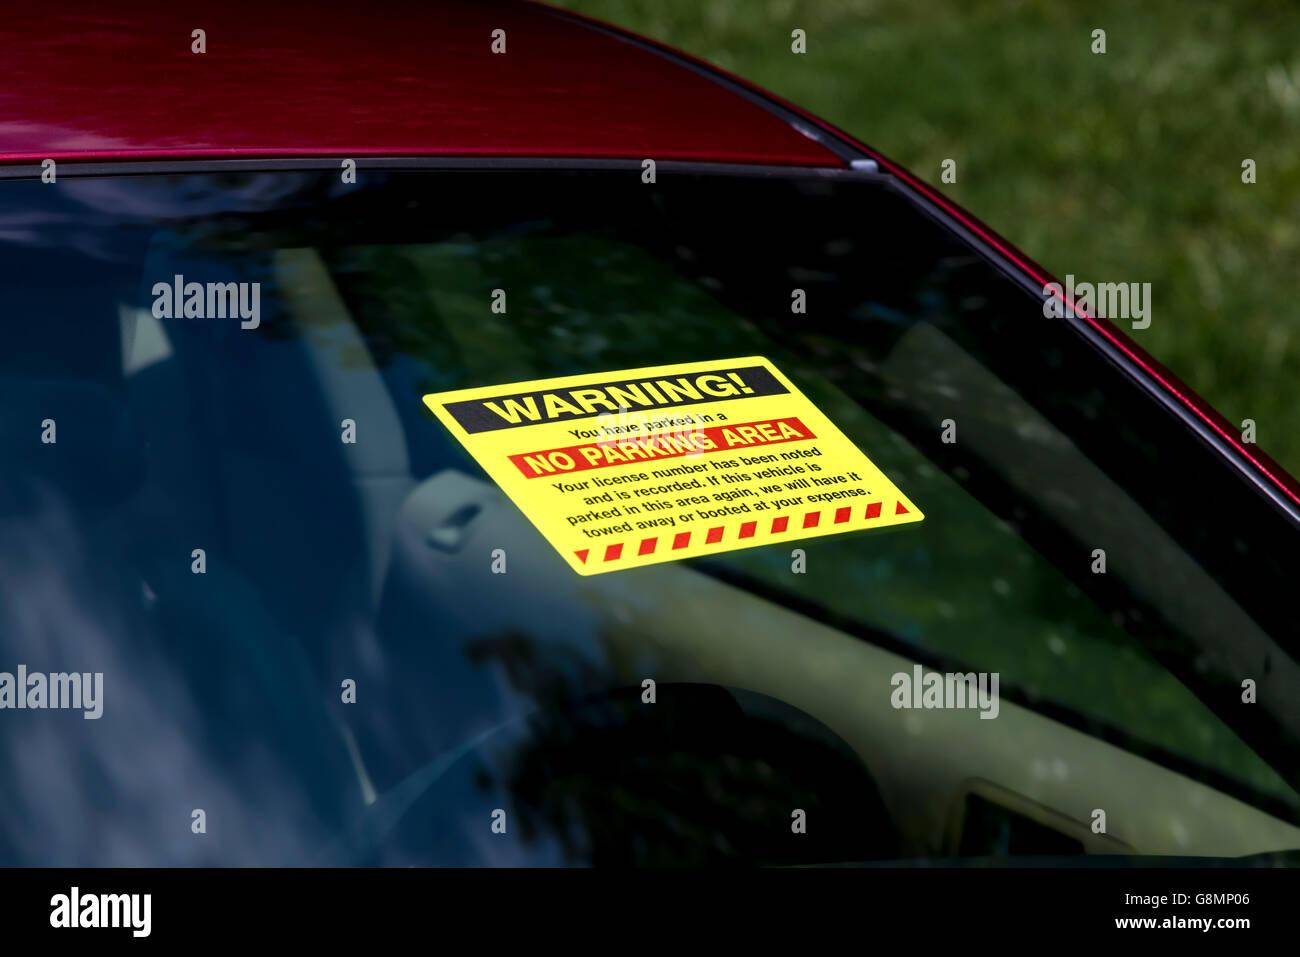 WARNING! Sticker on windshield of vehicle parked illegally. Horizontal shot - Stock Image